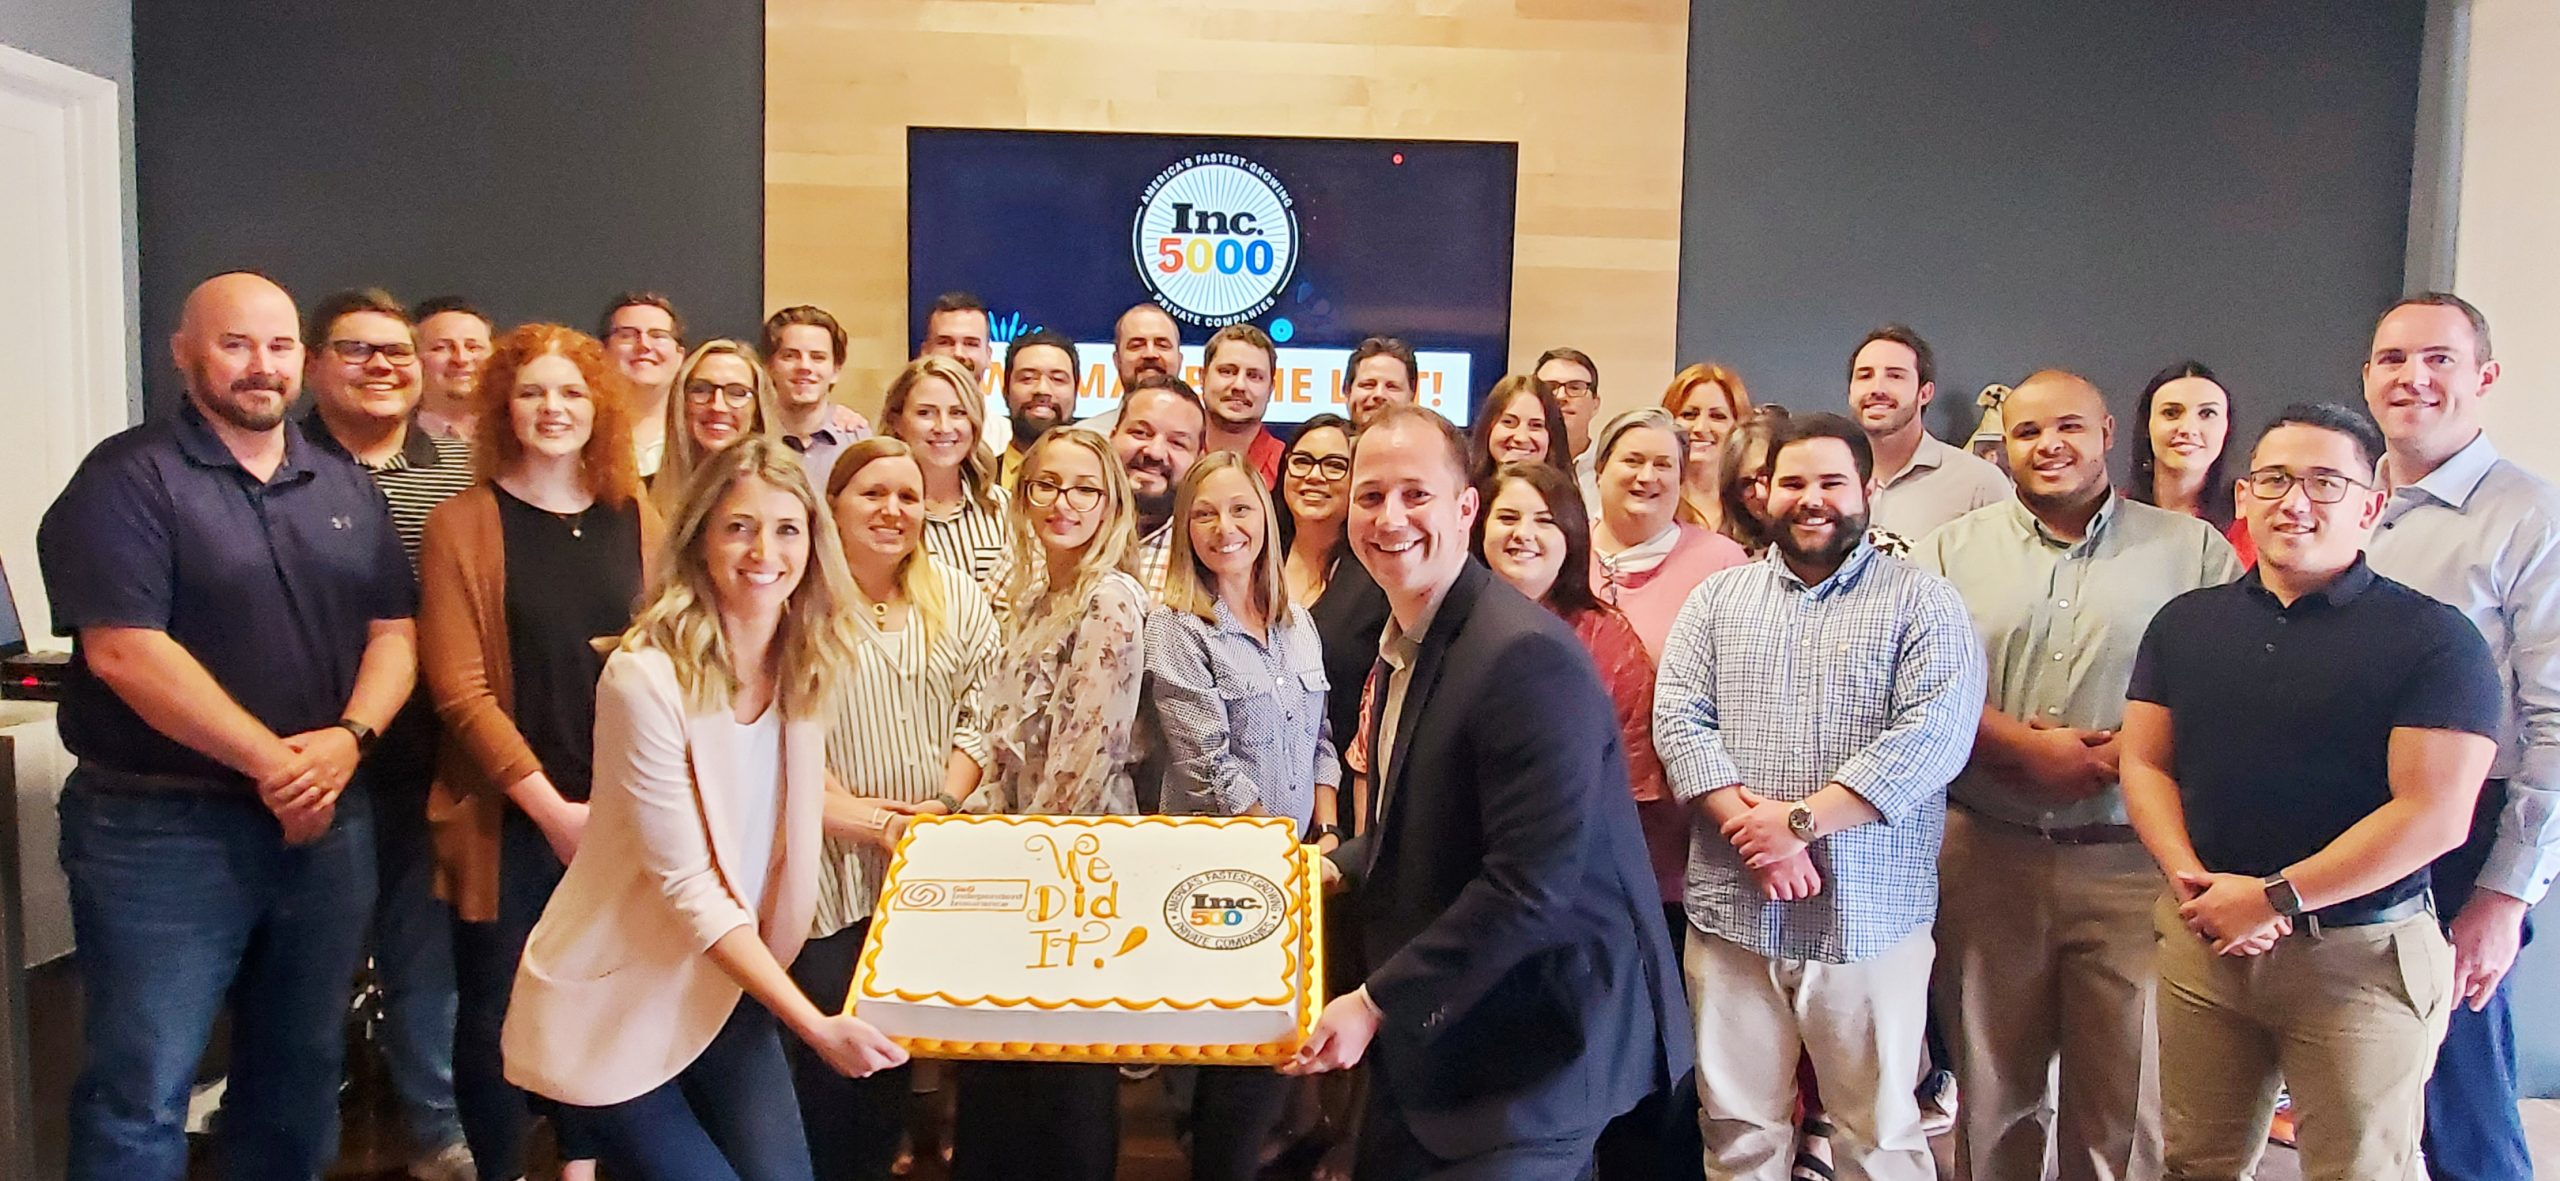 Inc 5000, Inc 5000 celebration, G&G, office